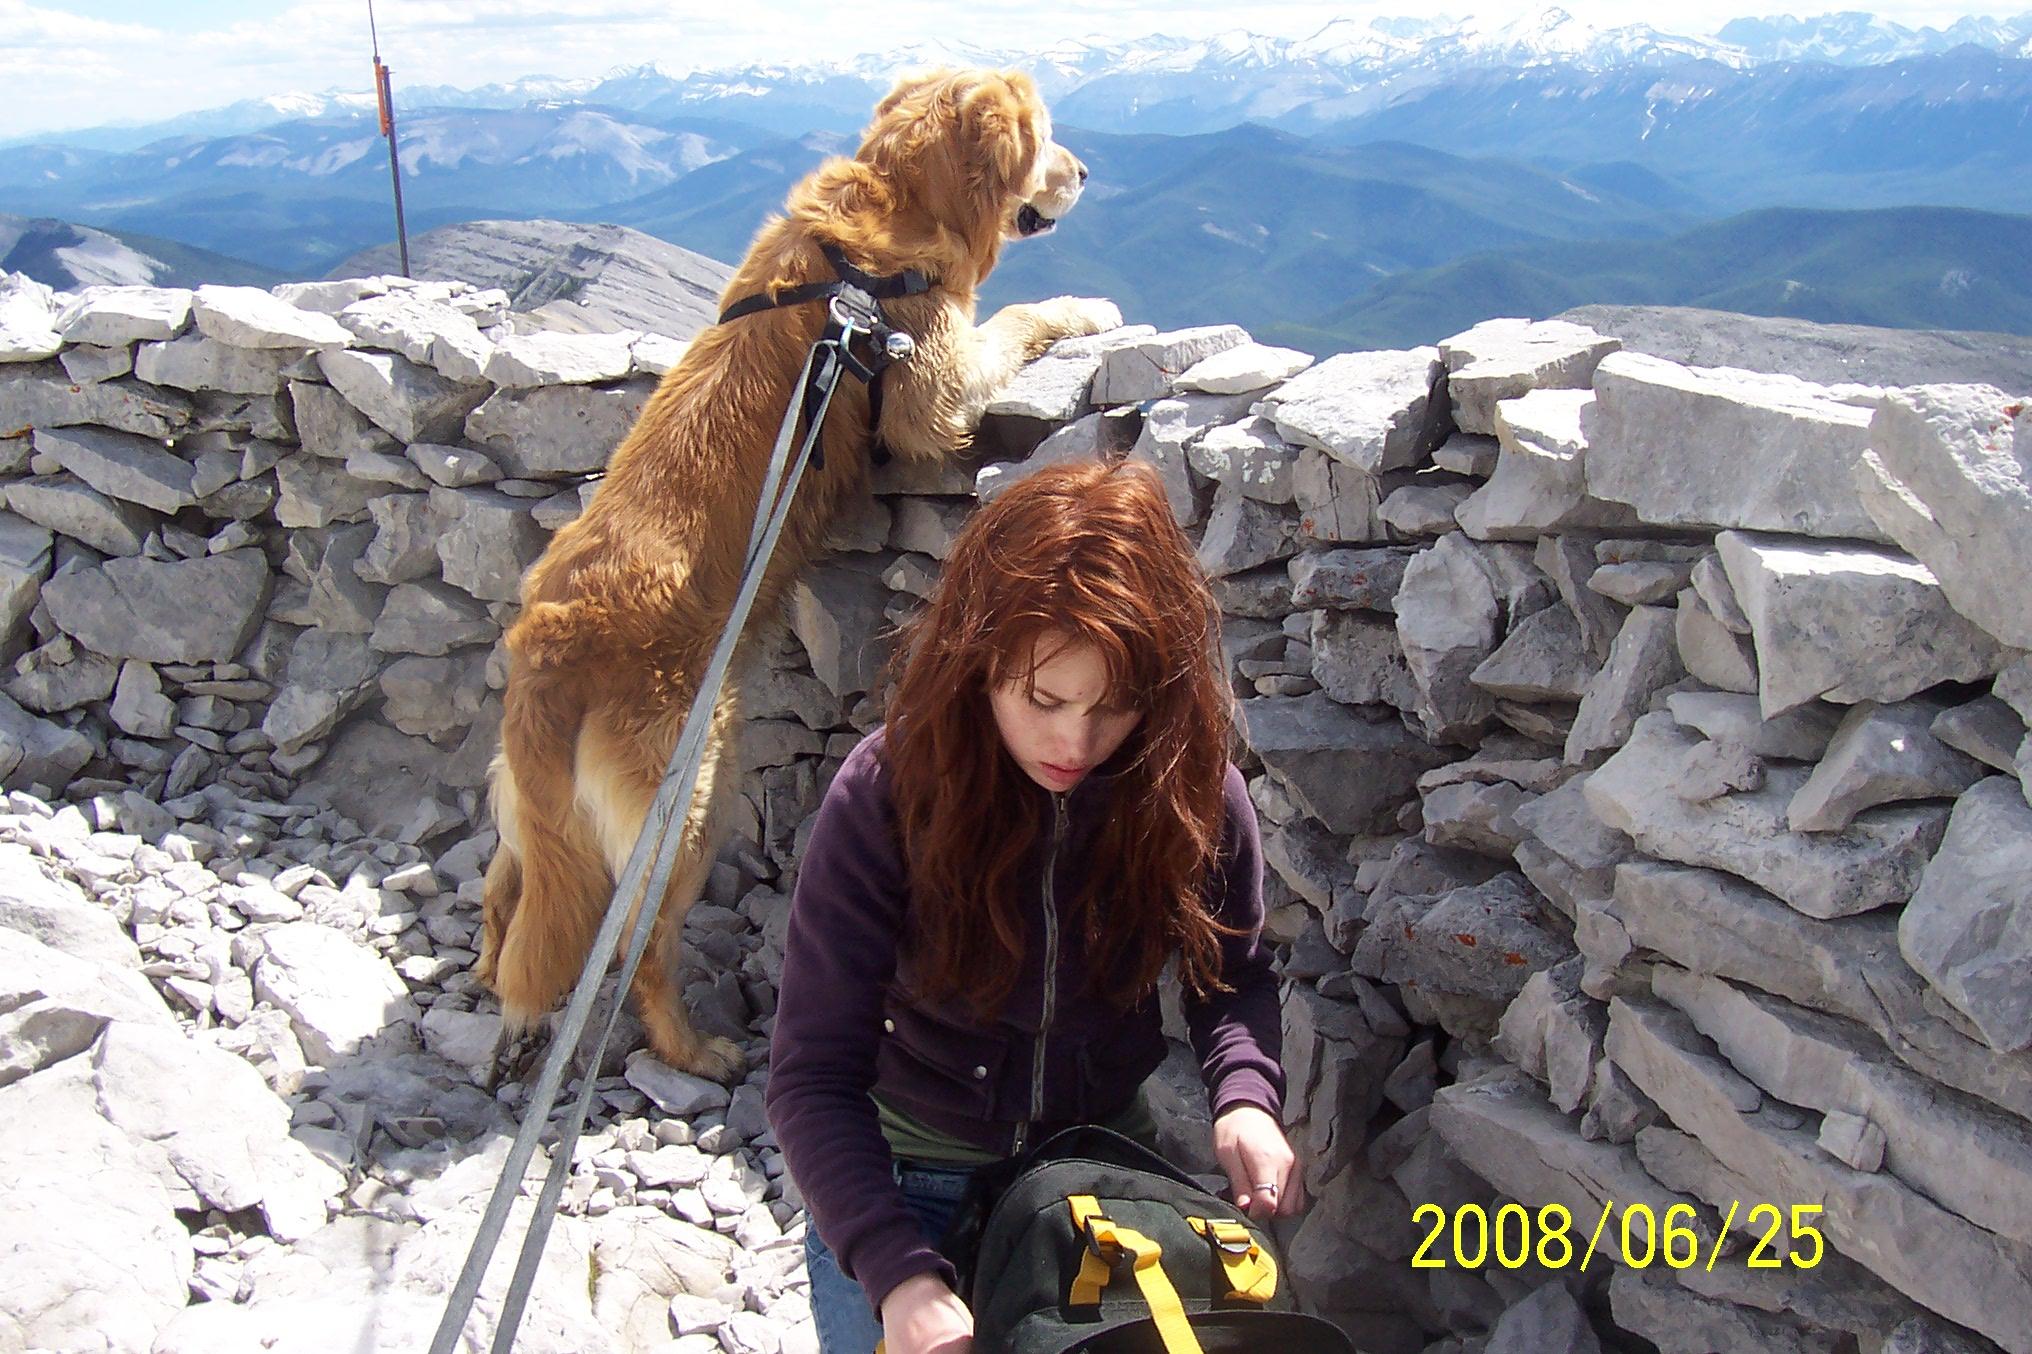 Moose Mountain 670 m 14 km round trip Jun 25 08 004